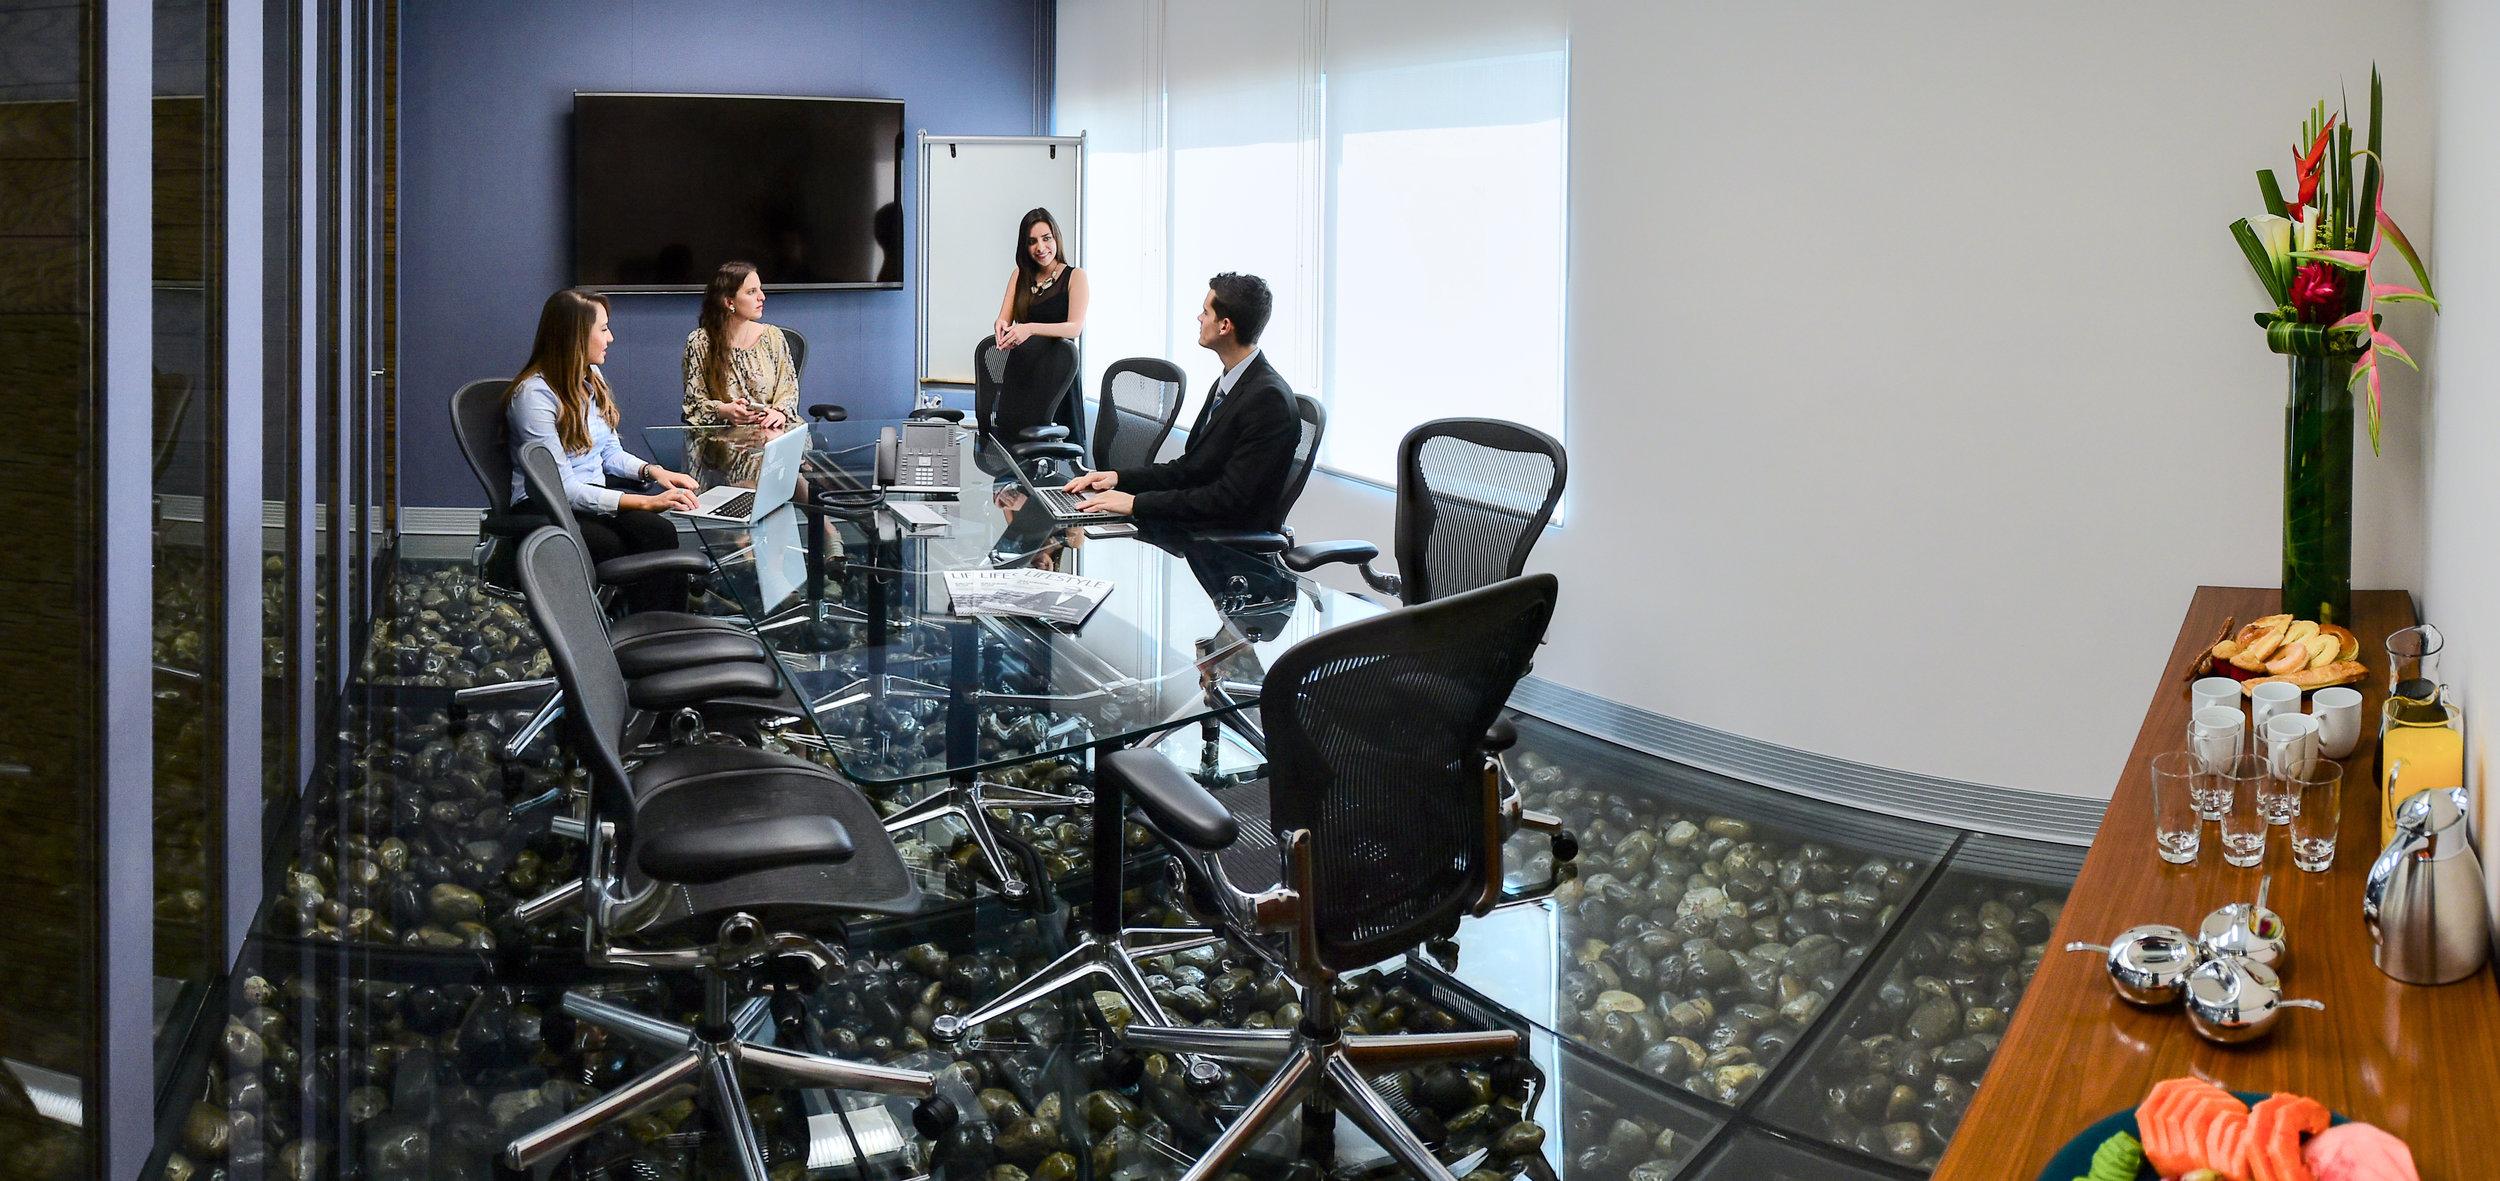 executive room1___TorreReformaDiana__008_X.jpg